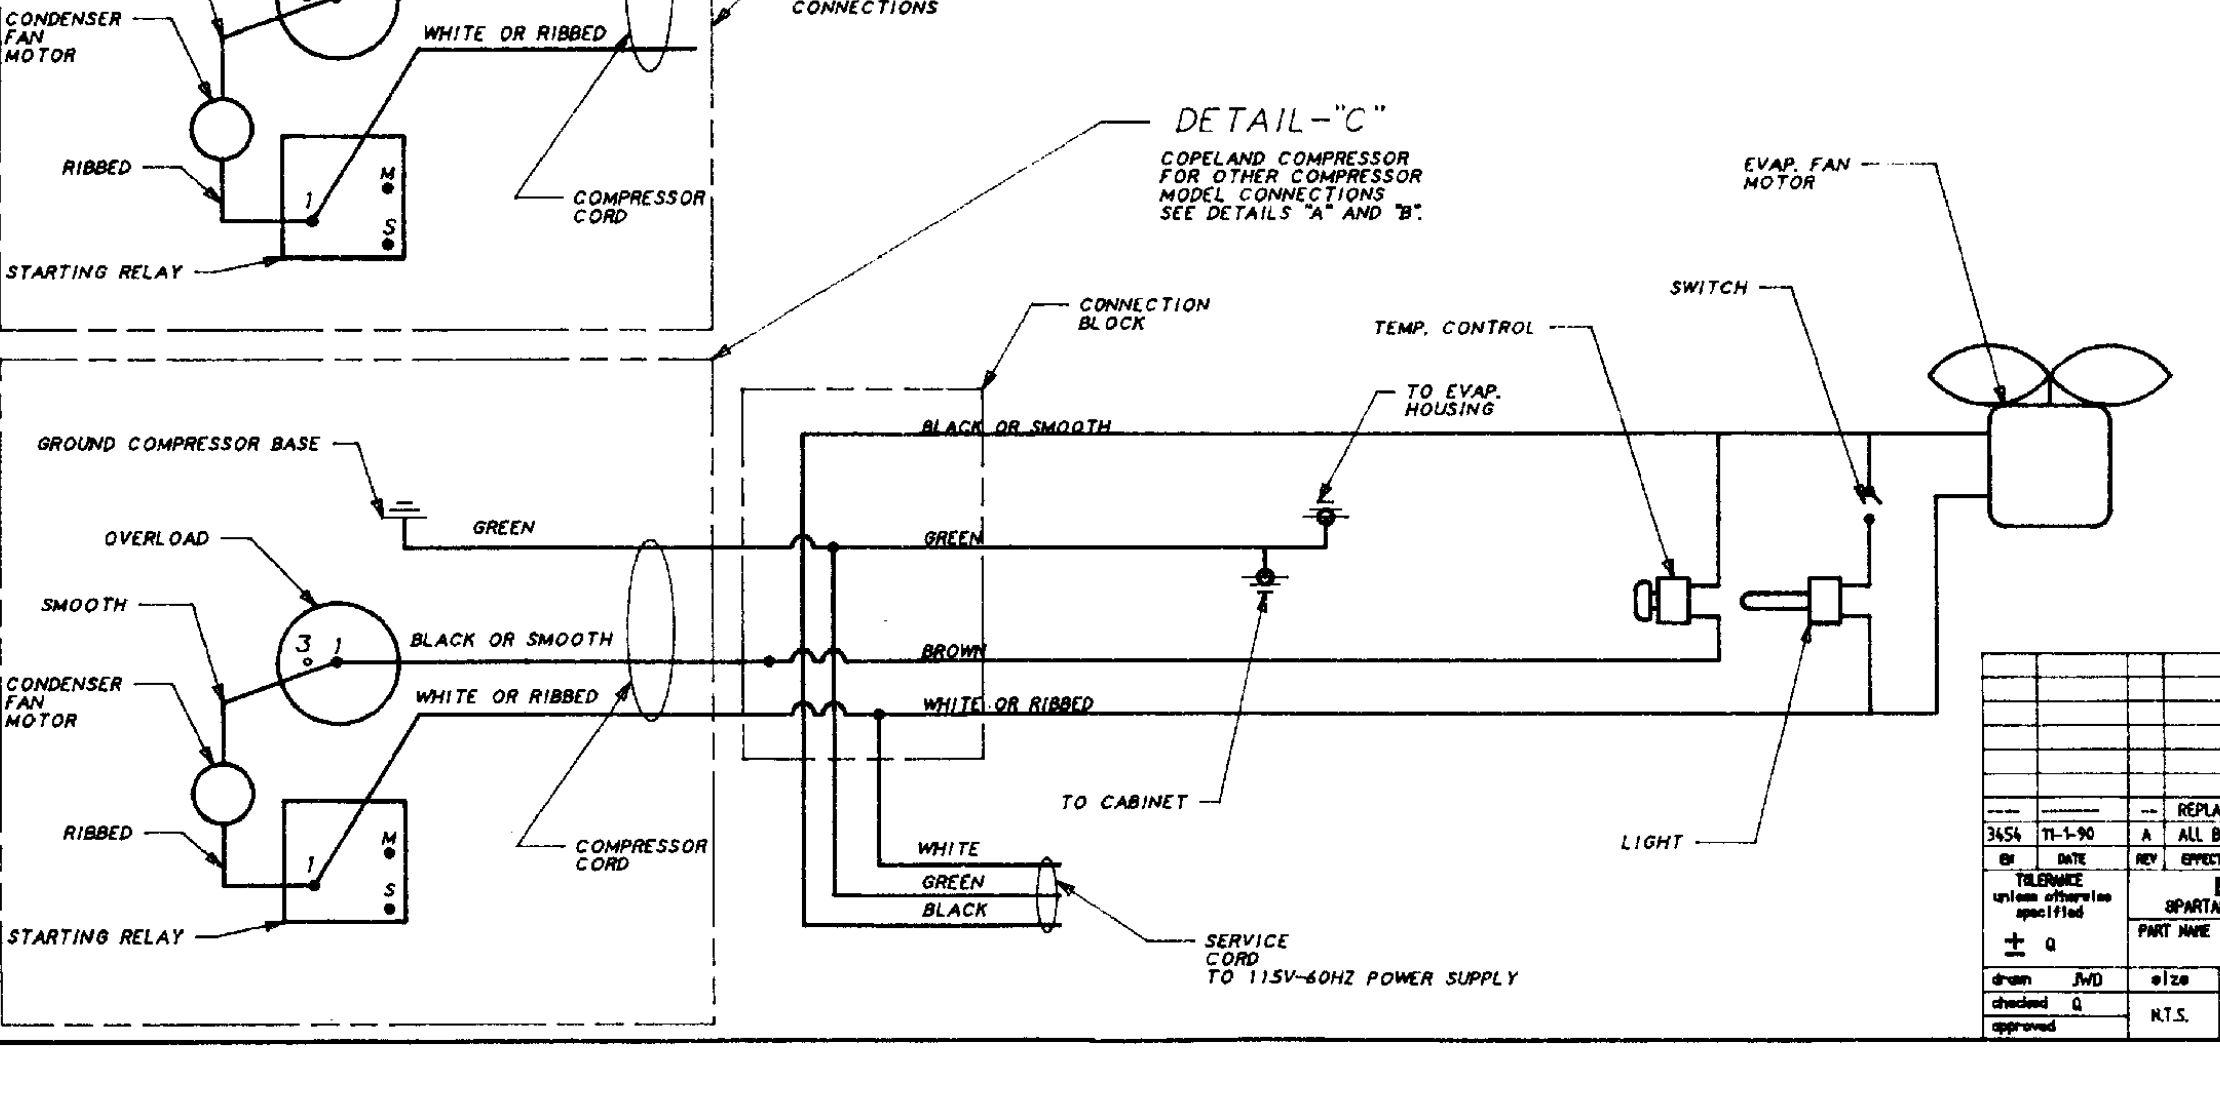 Need Help With Wiring My Fridge  - Fridge-build